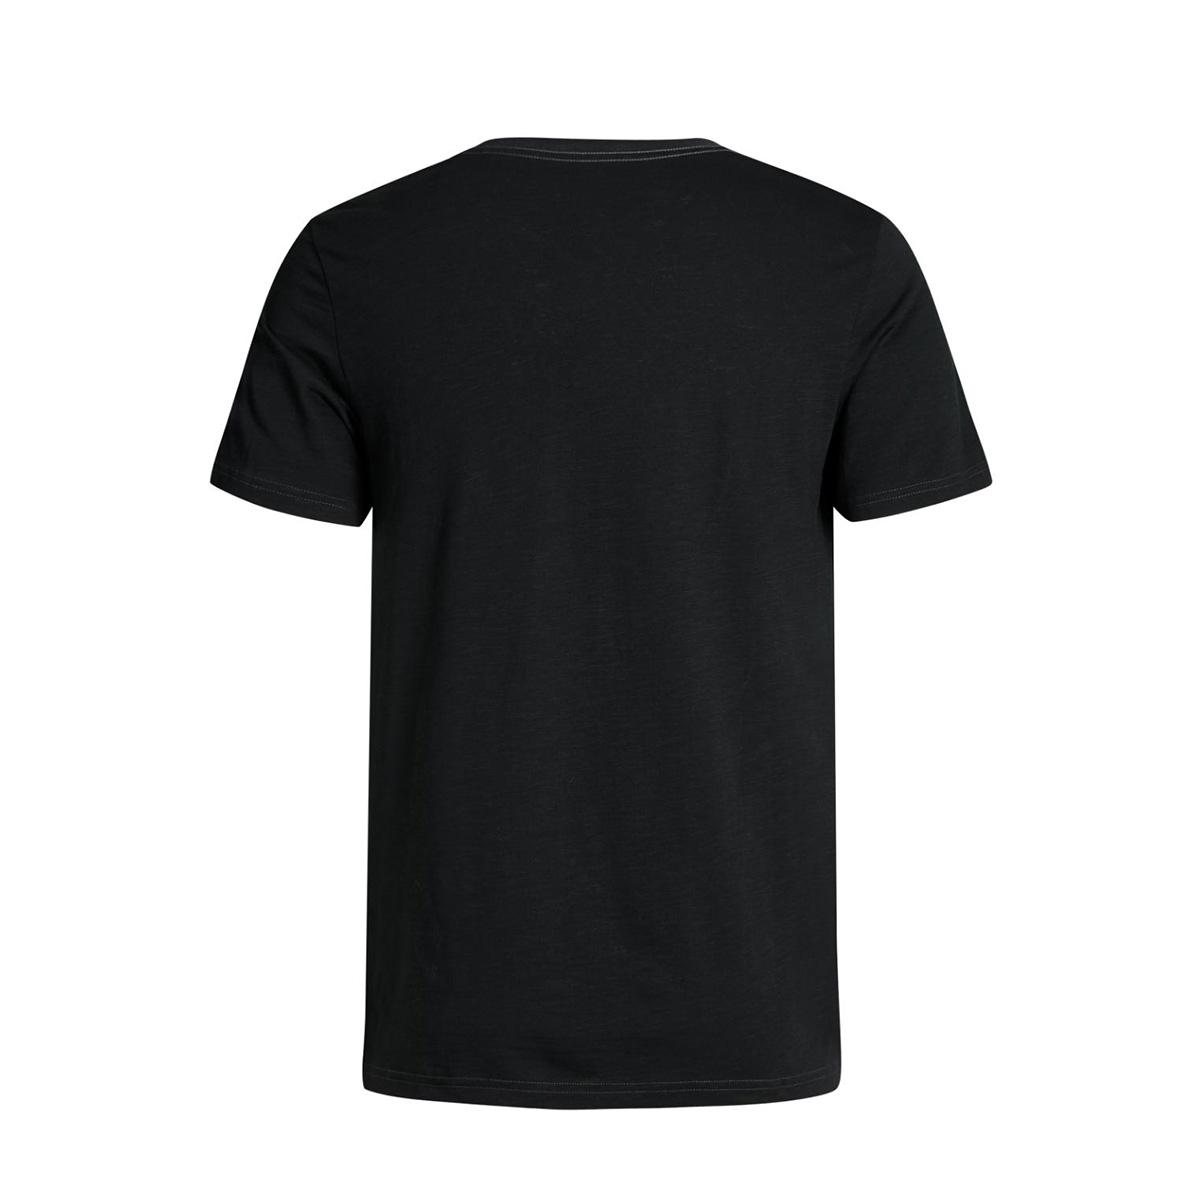 jjvrobert tee ss crew neck 12128099 jack & jones t-shirt caviar